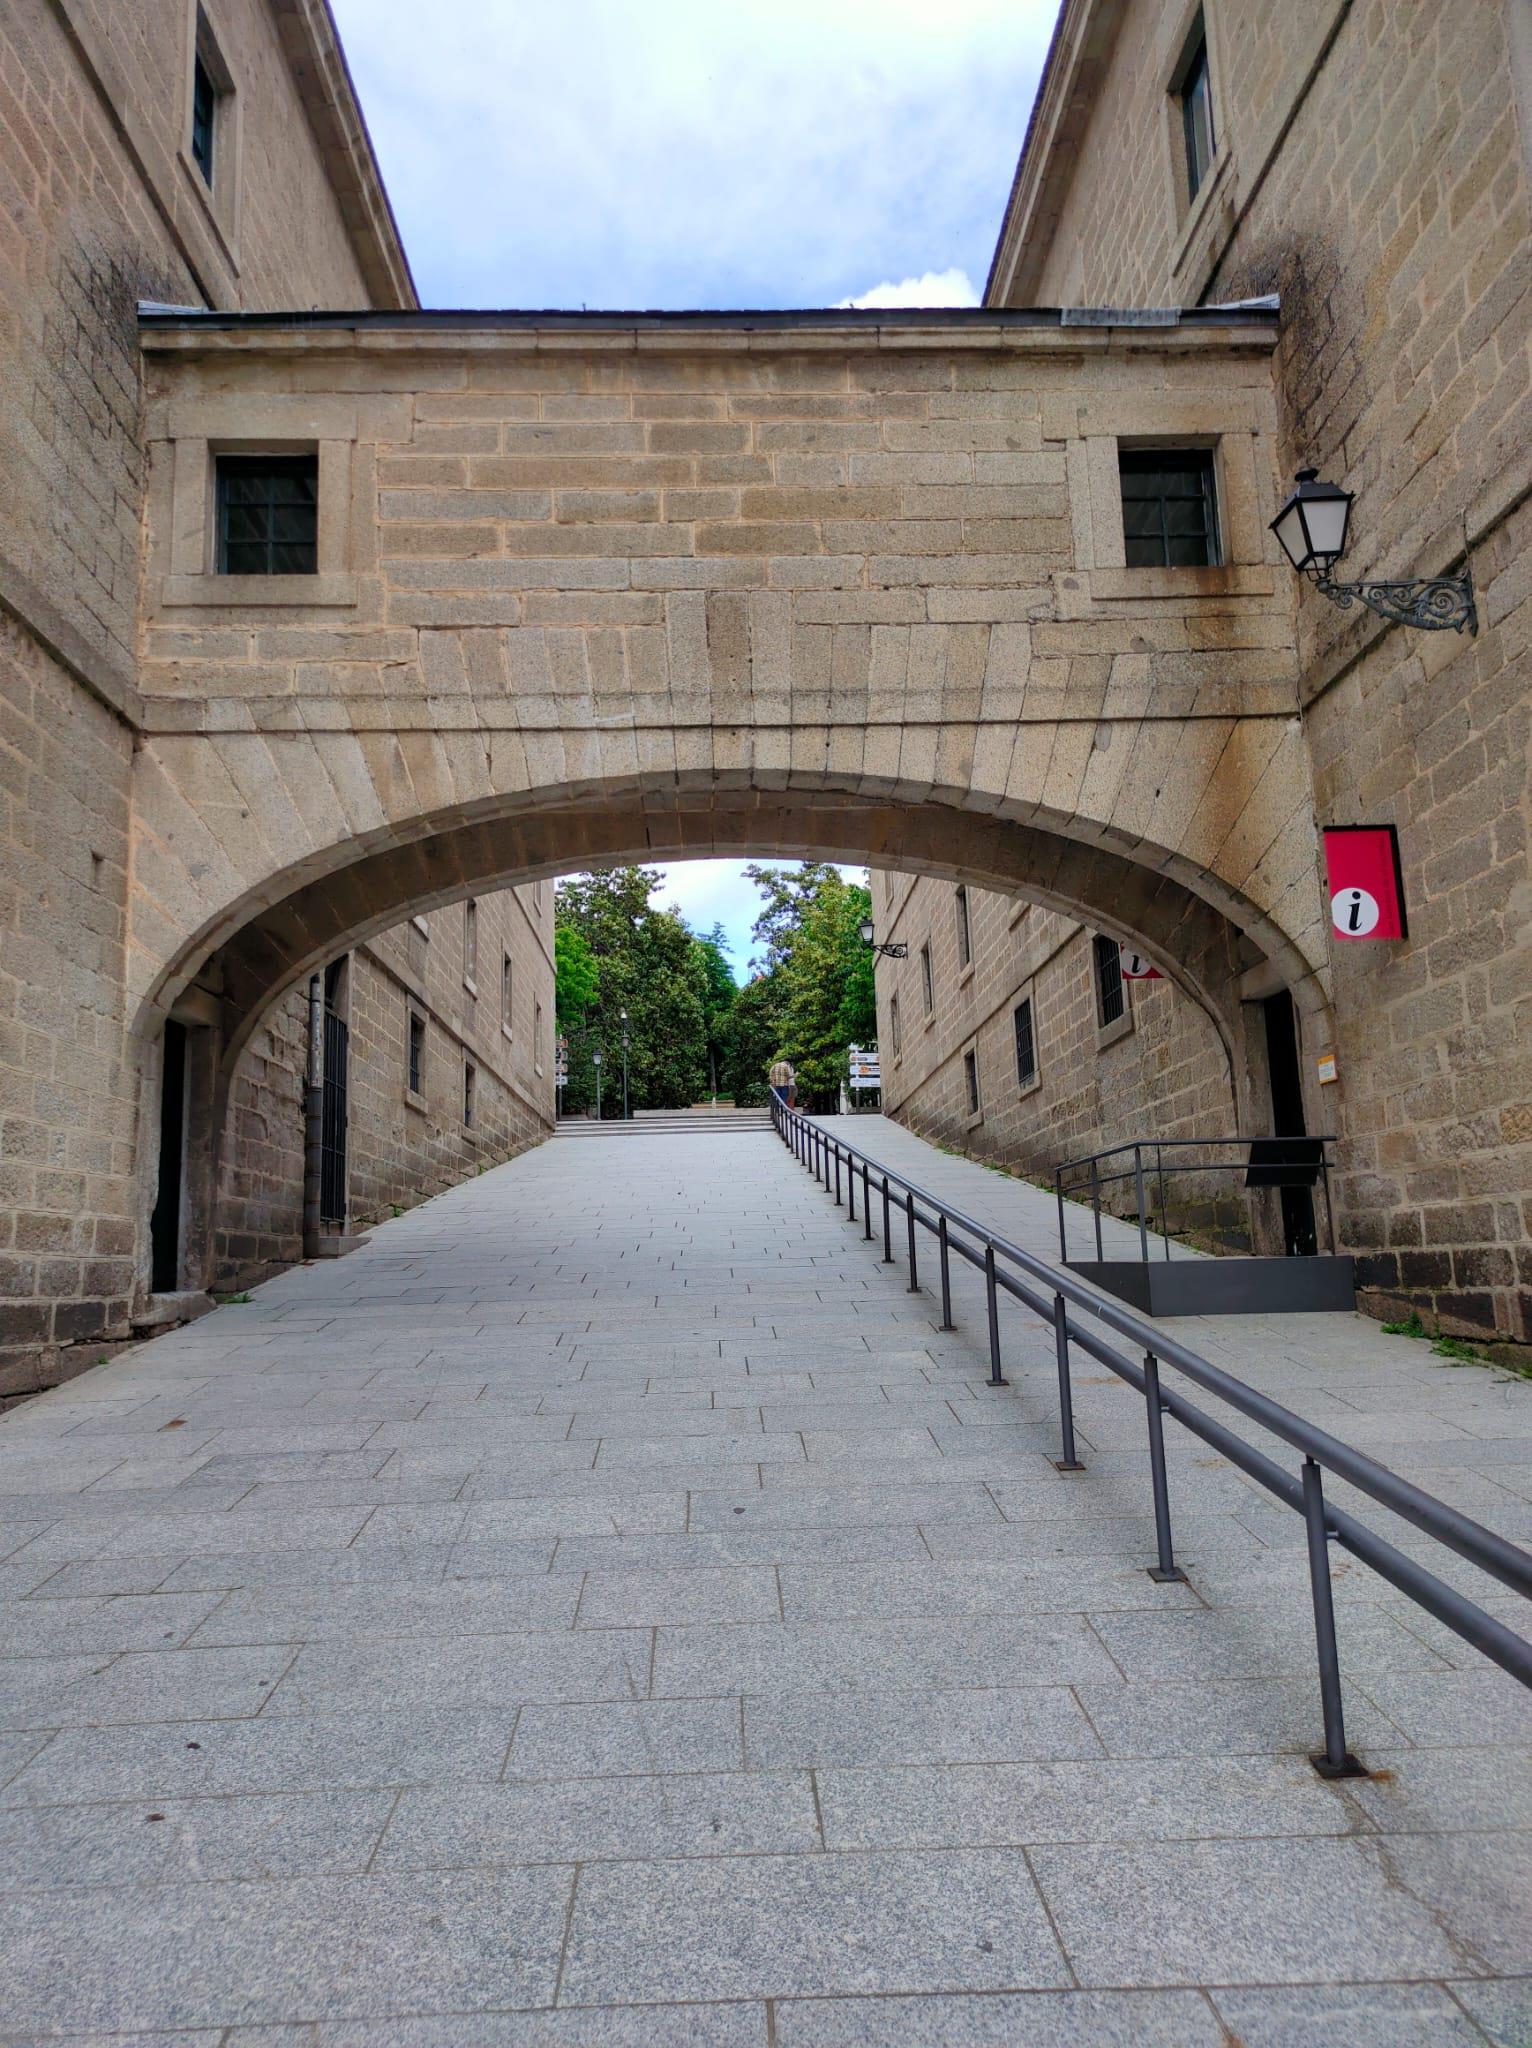 Tour-Monastery-of-El-Escorial-2